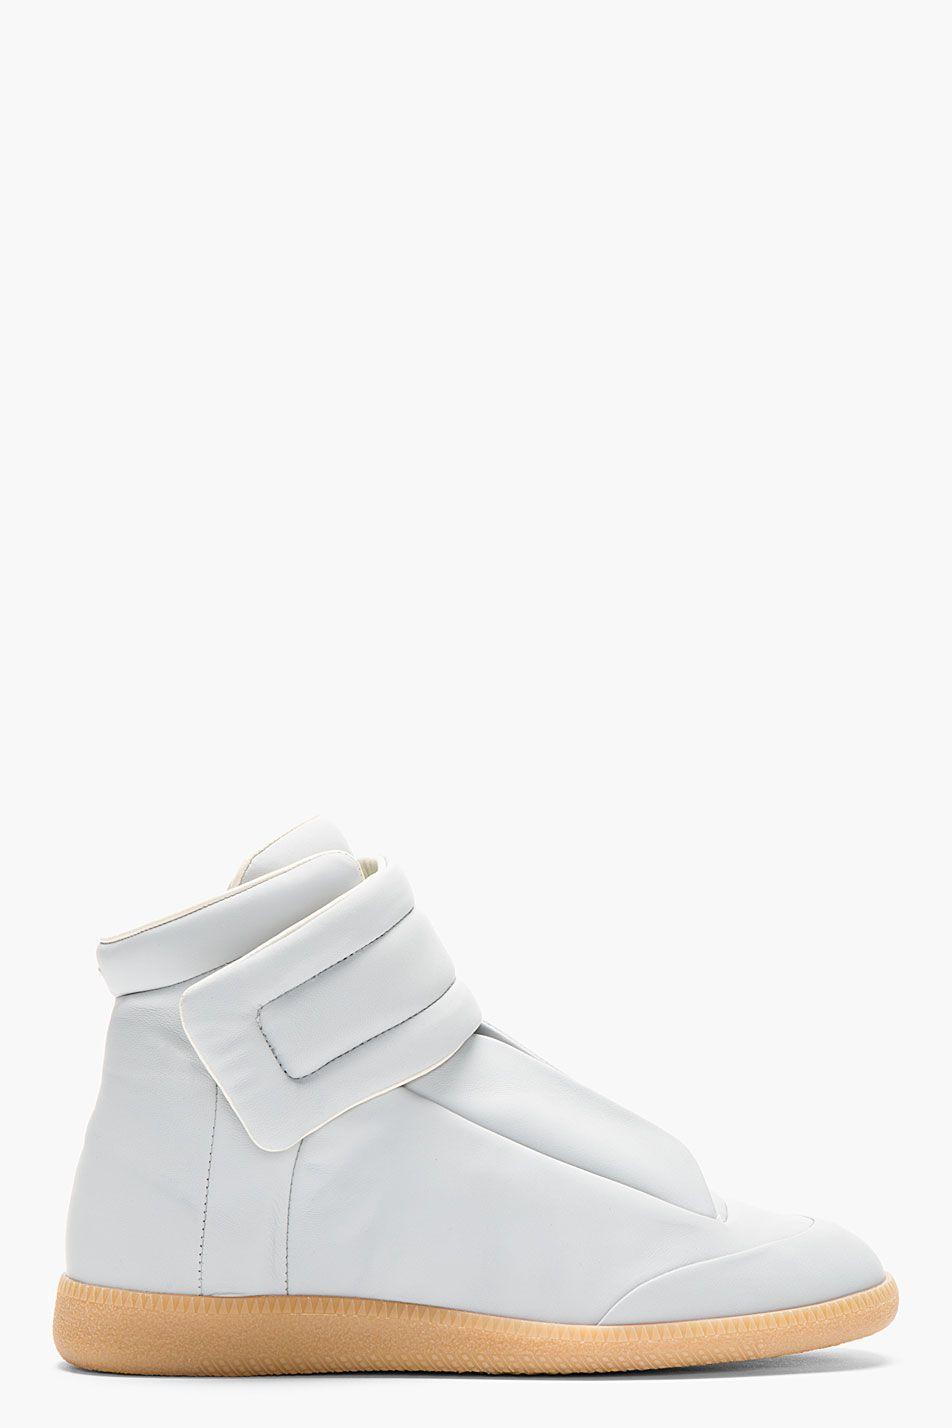 Maison Martin Margiela Light Grey Leather Future High top Sneakers